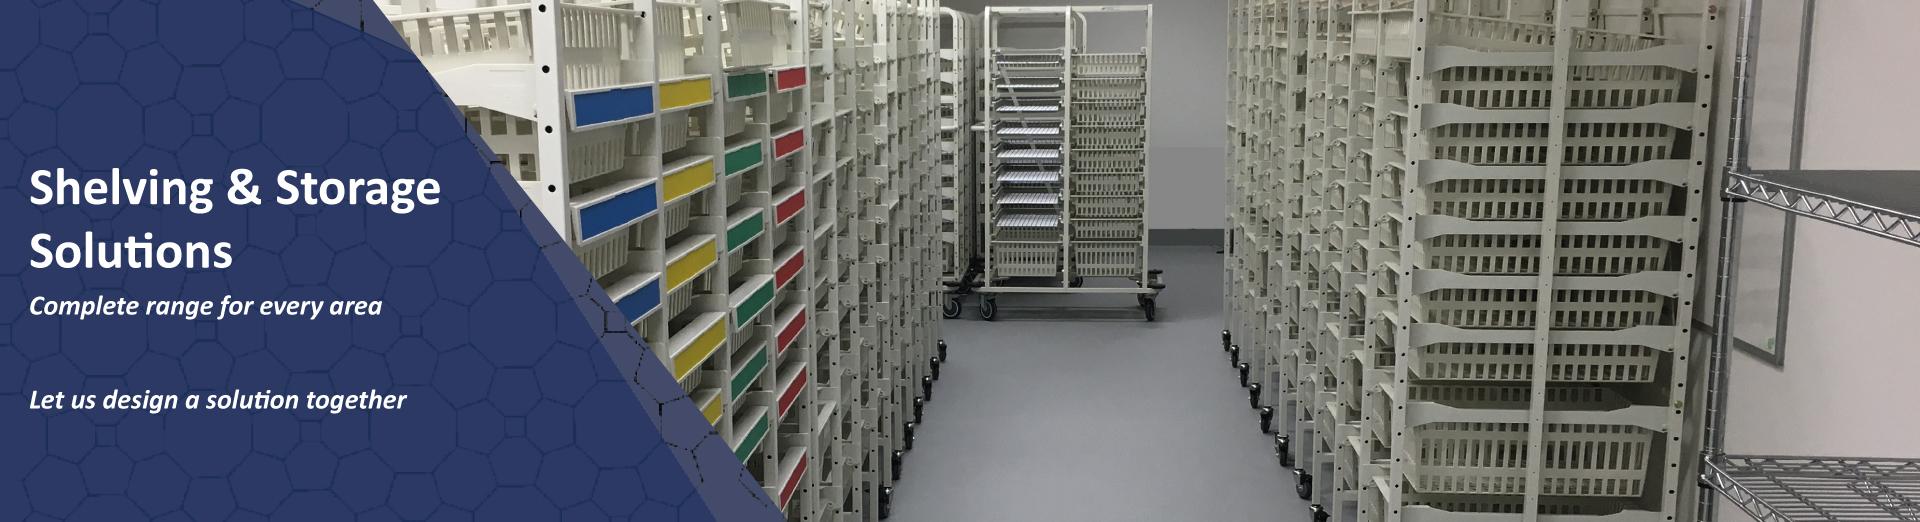 Shelving & Storage Hospitals